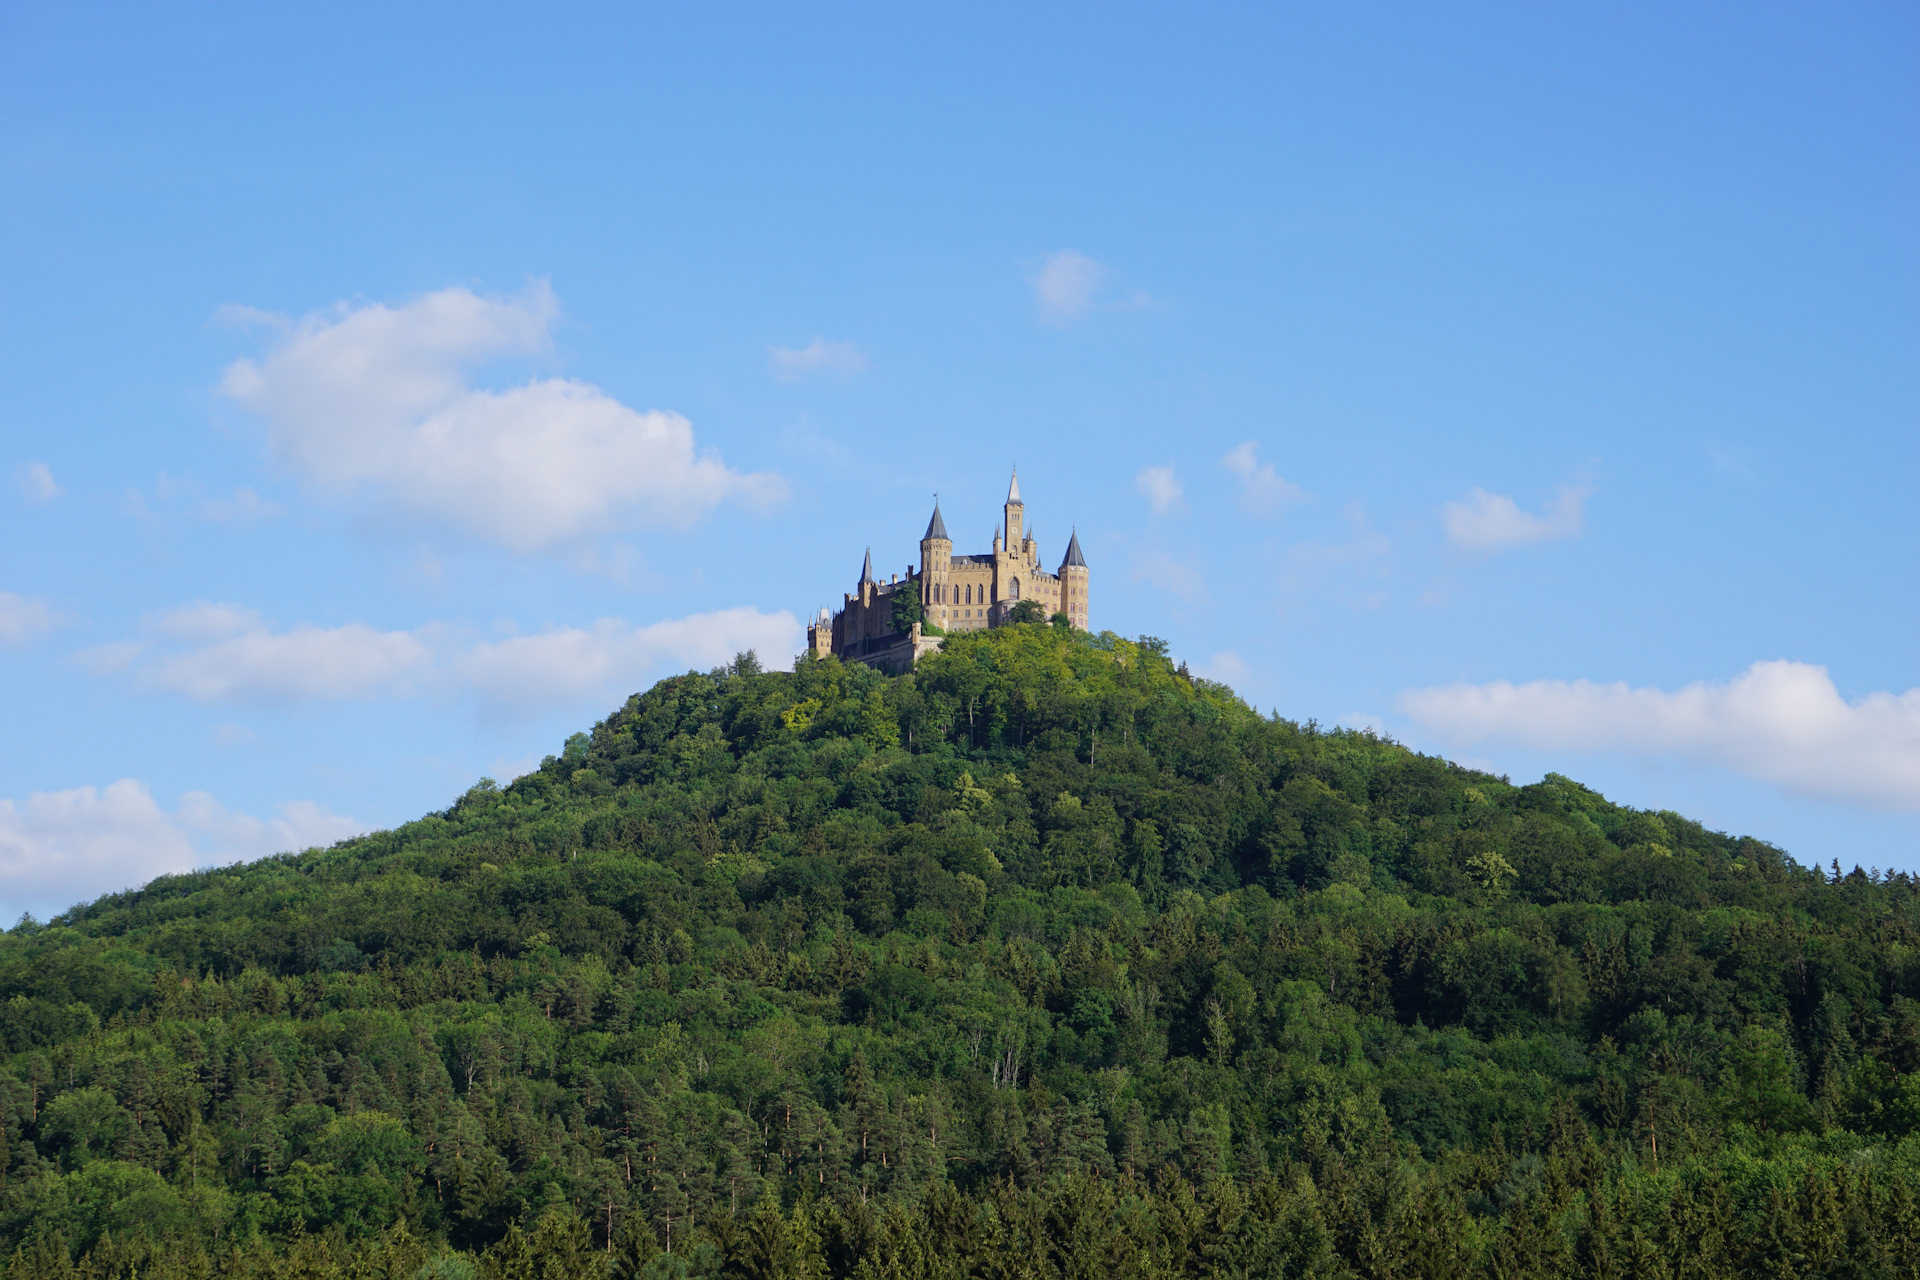 болгария картинка замок за горами сюрпризом